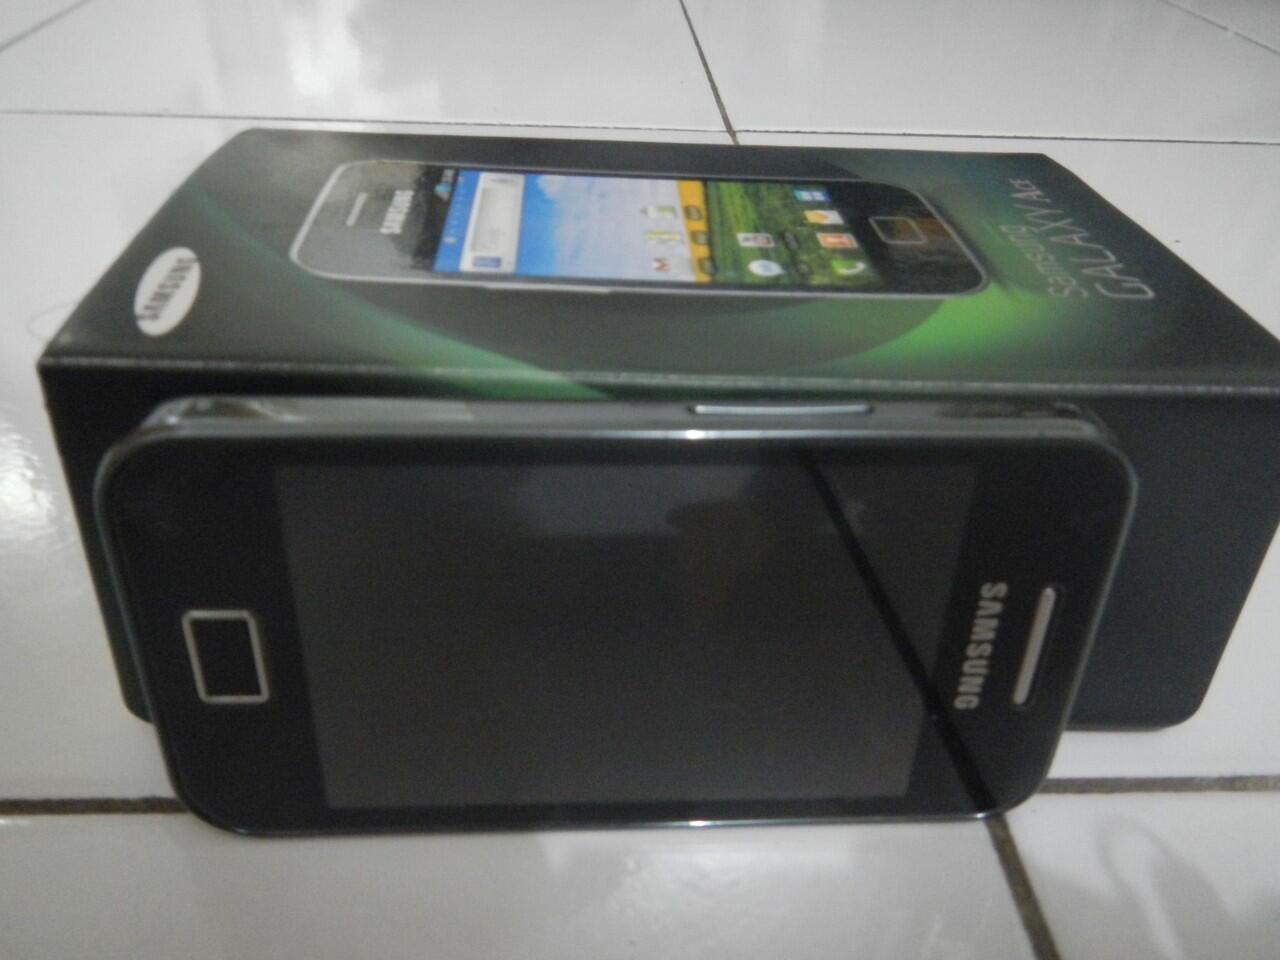 Samsung Galaxy Ace GT-S5830 2011 Bekas